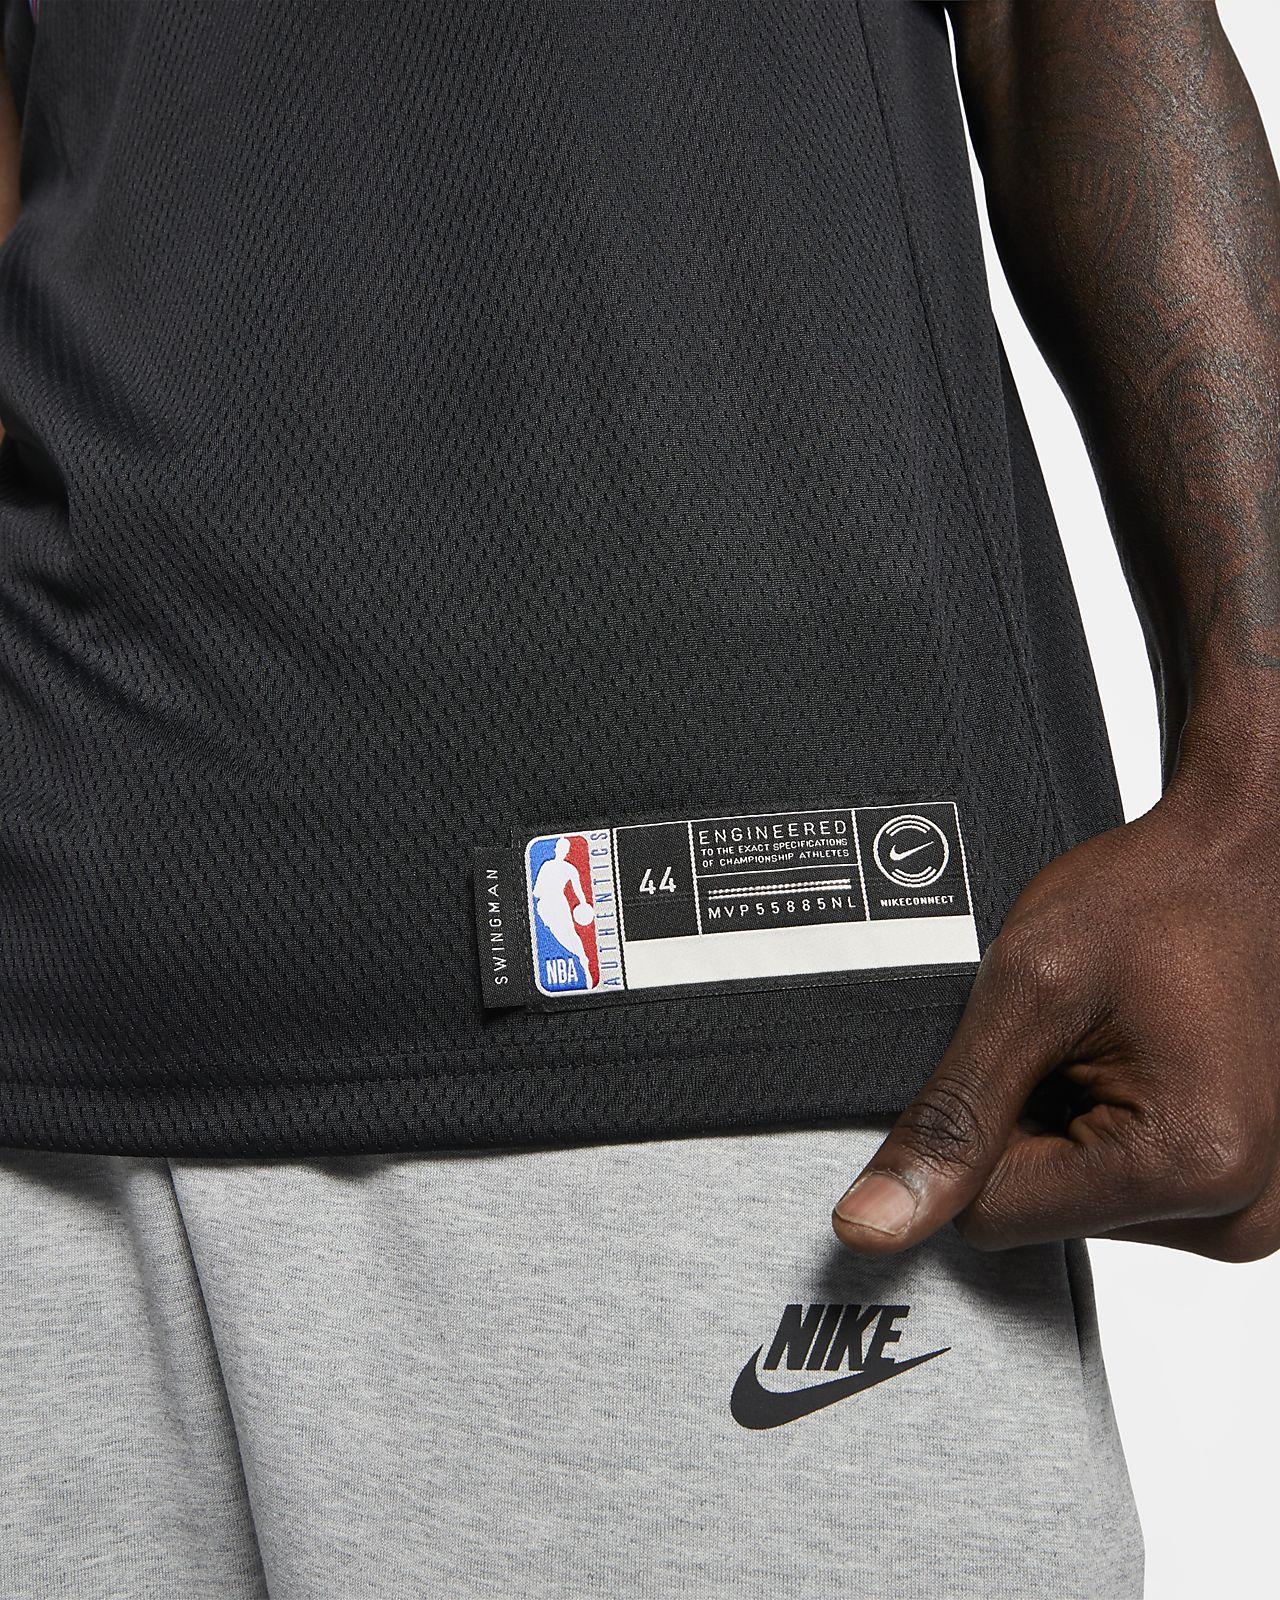 ad0664ee0 ... Dwyane Wade City Edition Swingman (Miami Heat) Men s Nike NBA Connected  Jersey